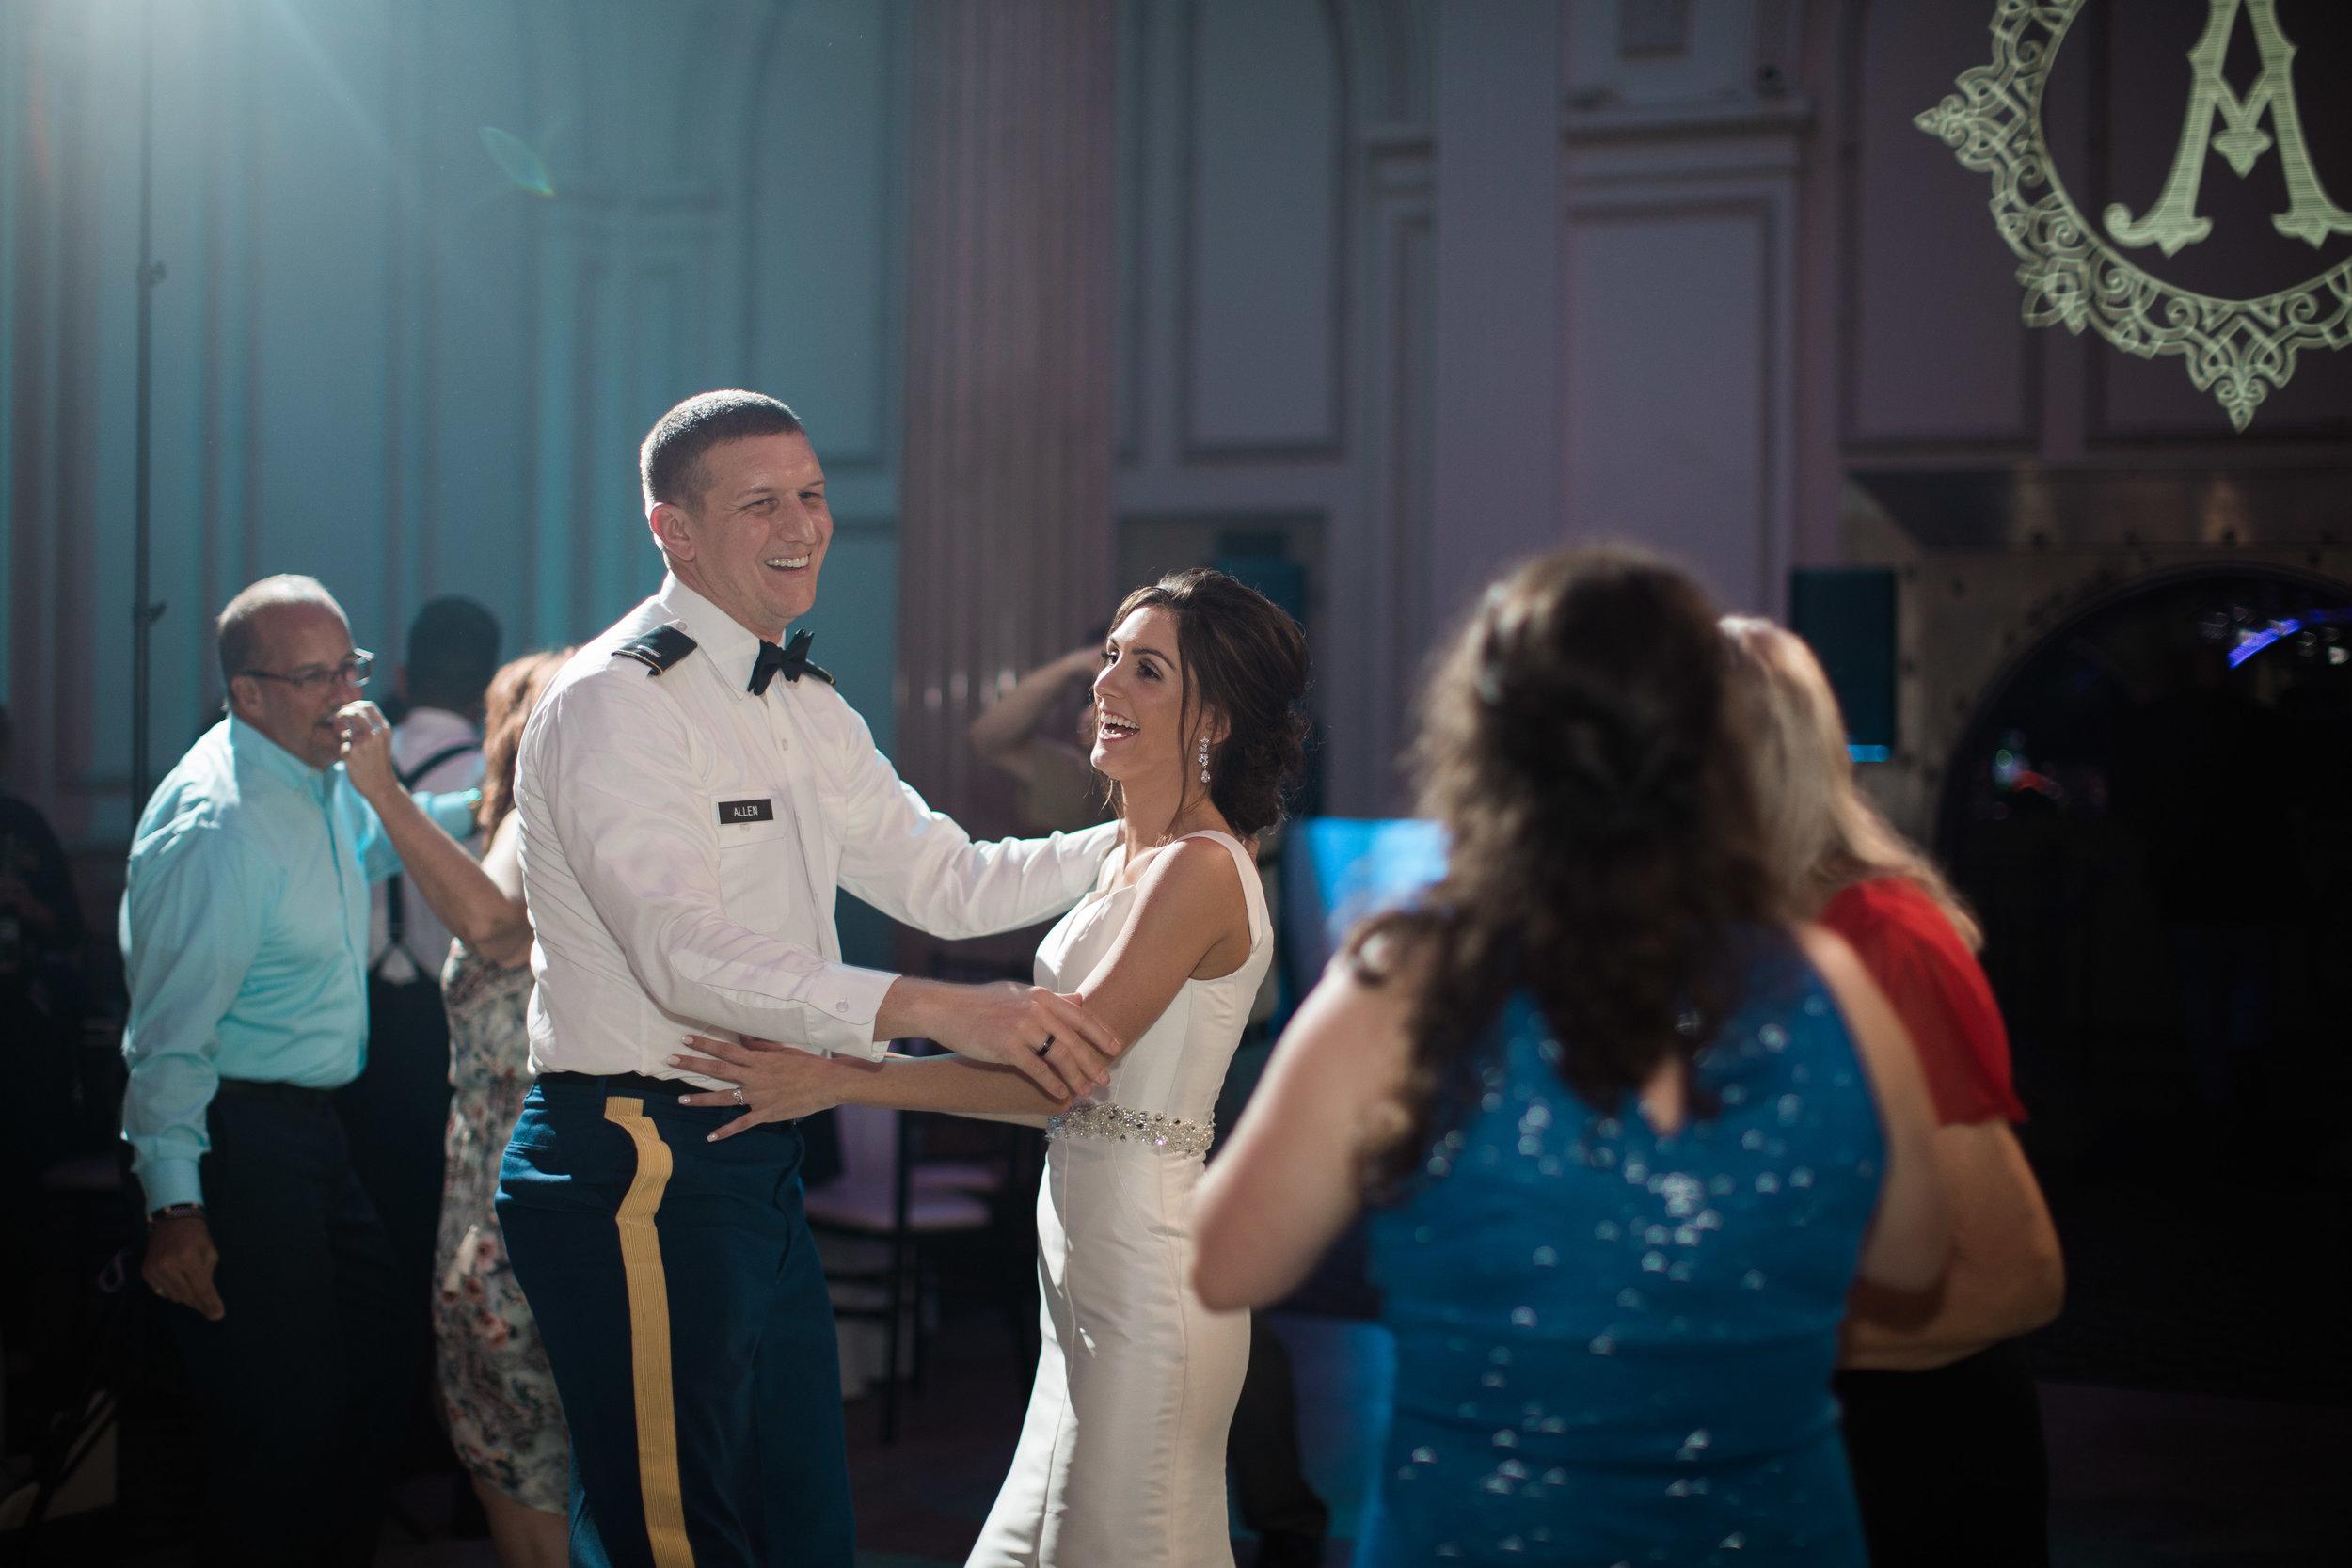 Taylor_TJ_St_Augustine_Treasury_on_the_Plaza_Wedding_Photography__0058_-58.jpg